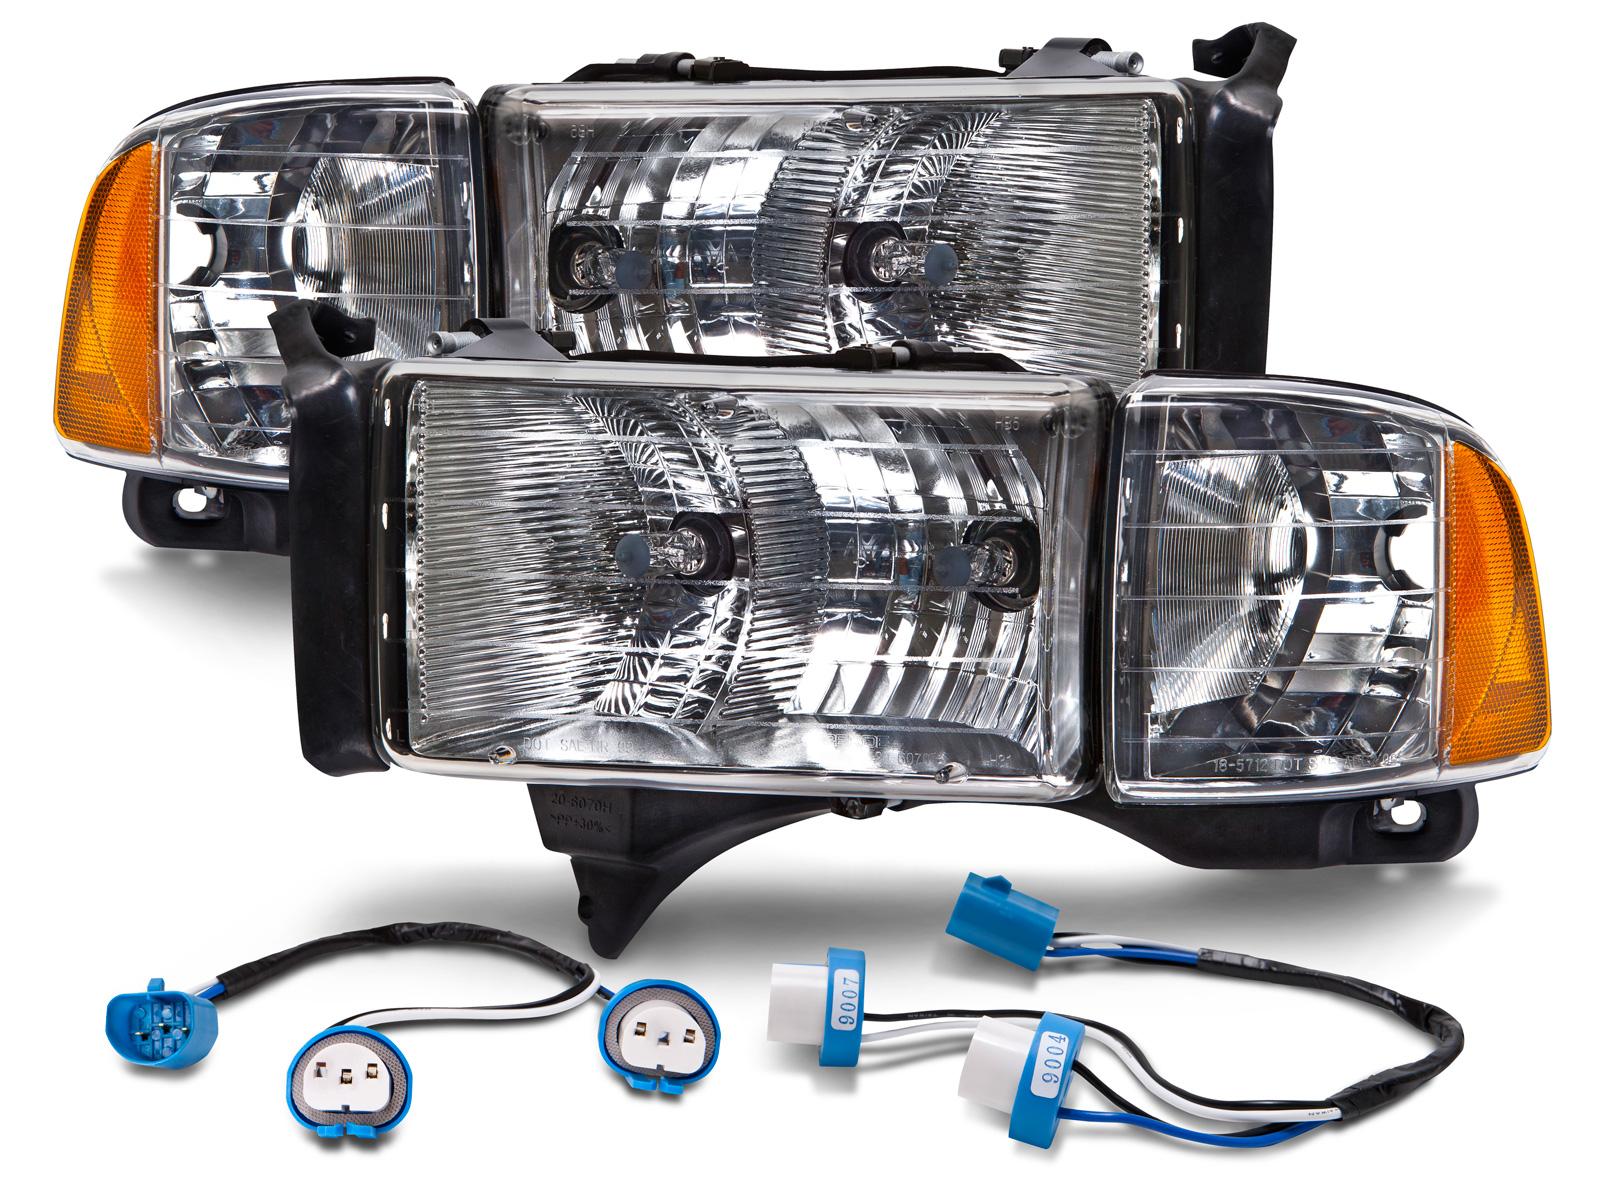 1994 Dodge Ram Headlight Harness Electrical Wiring Diagram 94 02 Sport Pickup Conversion Headlamps 1500 Switch